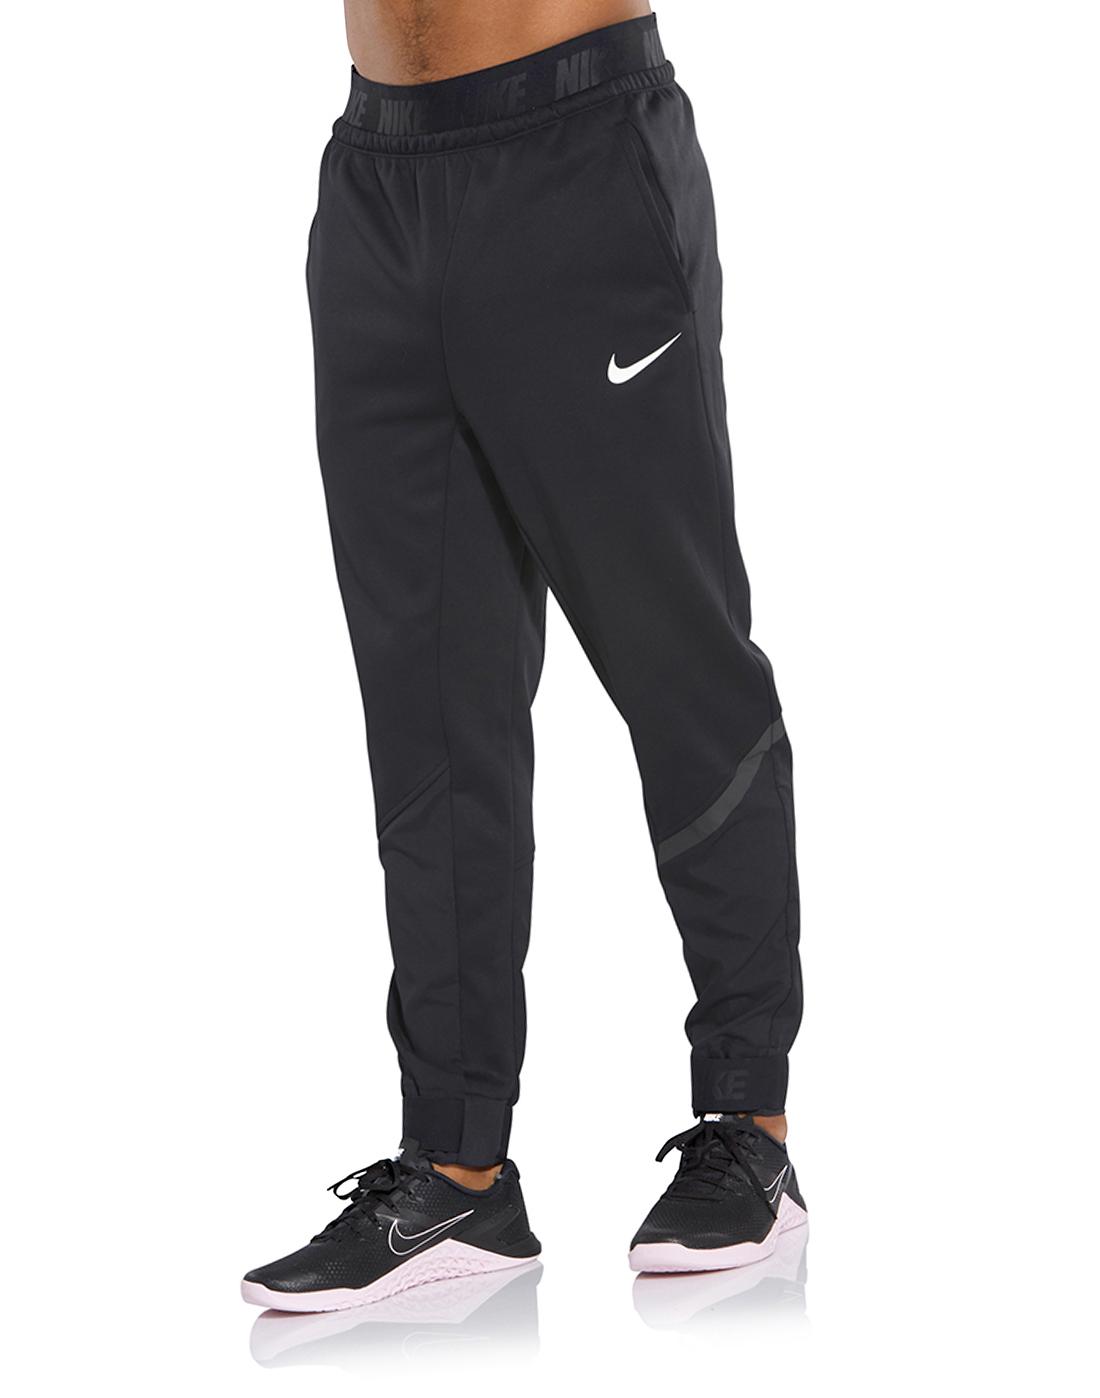 fff1c6e0cf2c Men s Black Nike Therma Gym Track Bottoms